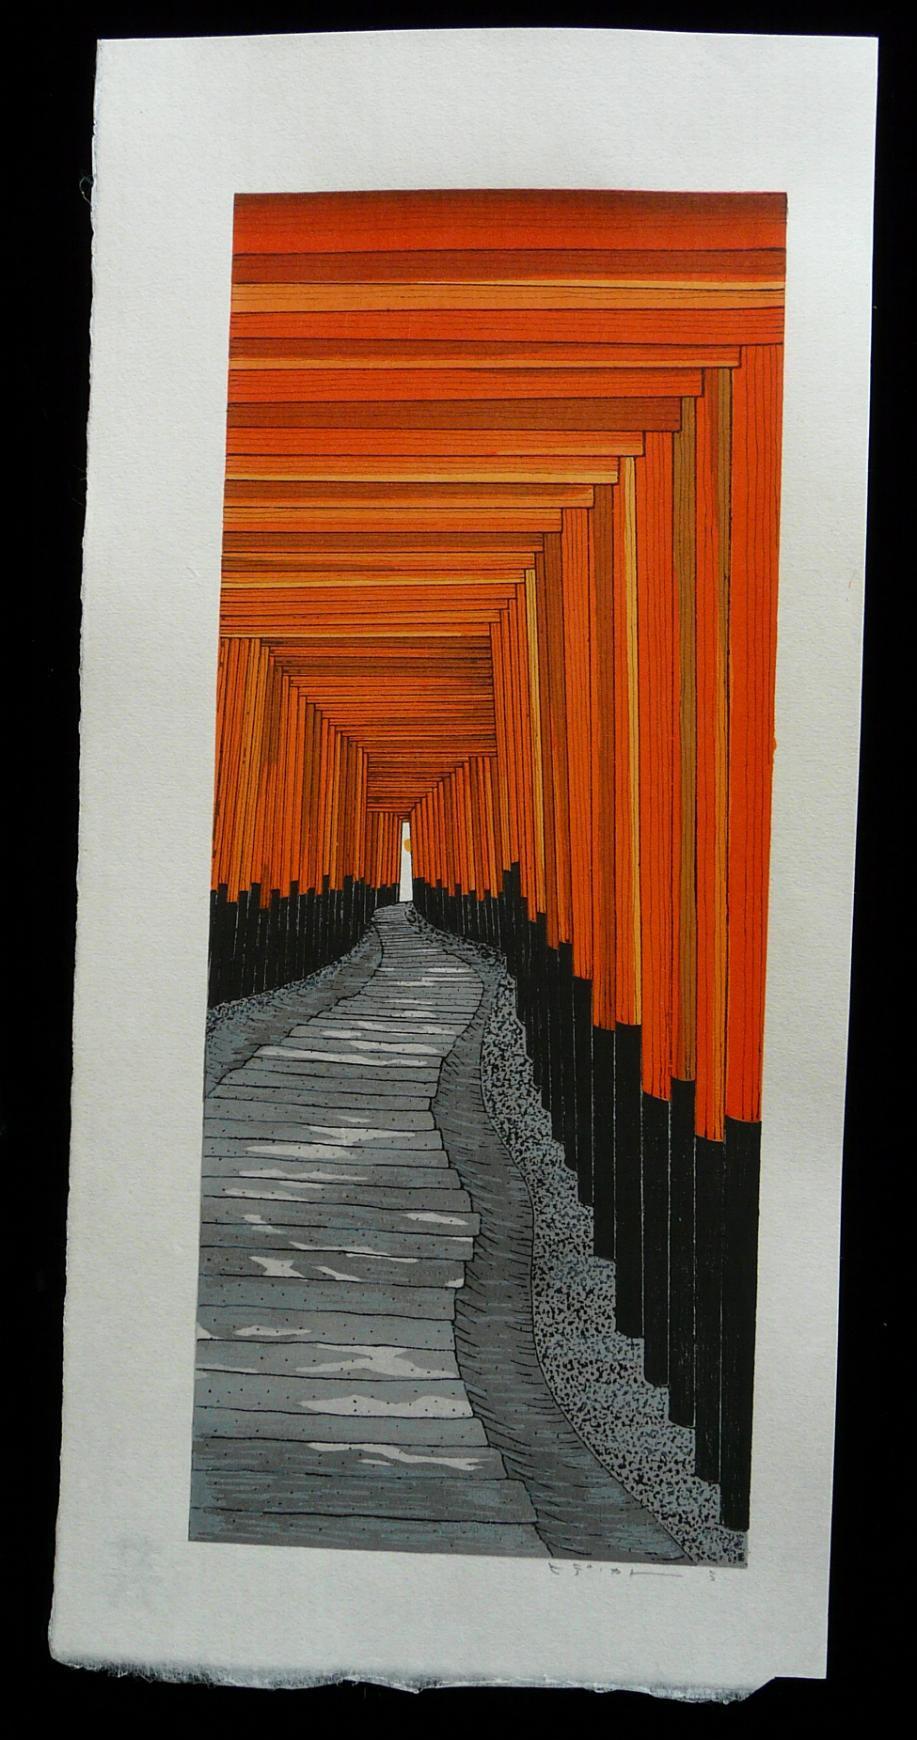 TERUHIDE KATO: #P4211 FUSHIMI INARI SHRINE IN KYOTO